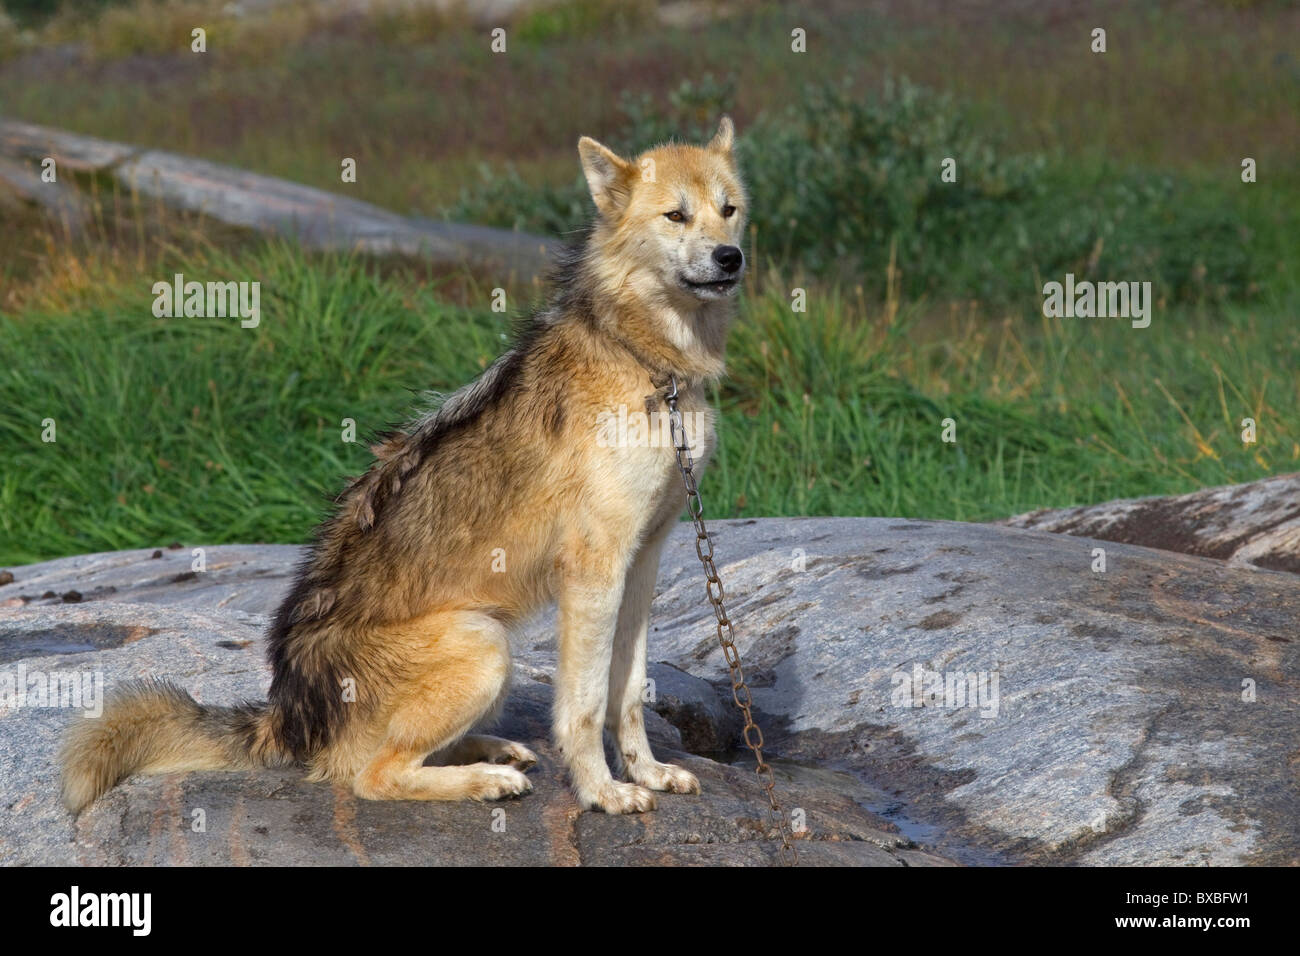 Greenland dog (Canis lupus familiaris), sledge dog, Ilulissat, West-Greenland, Greenland - Stock Image